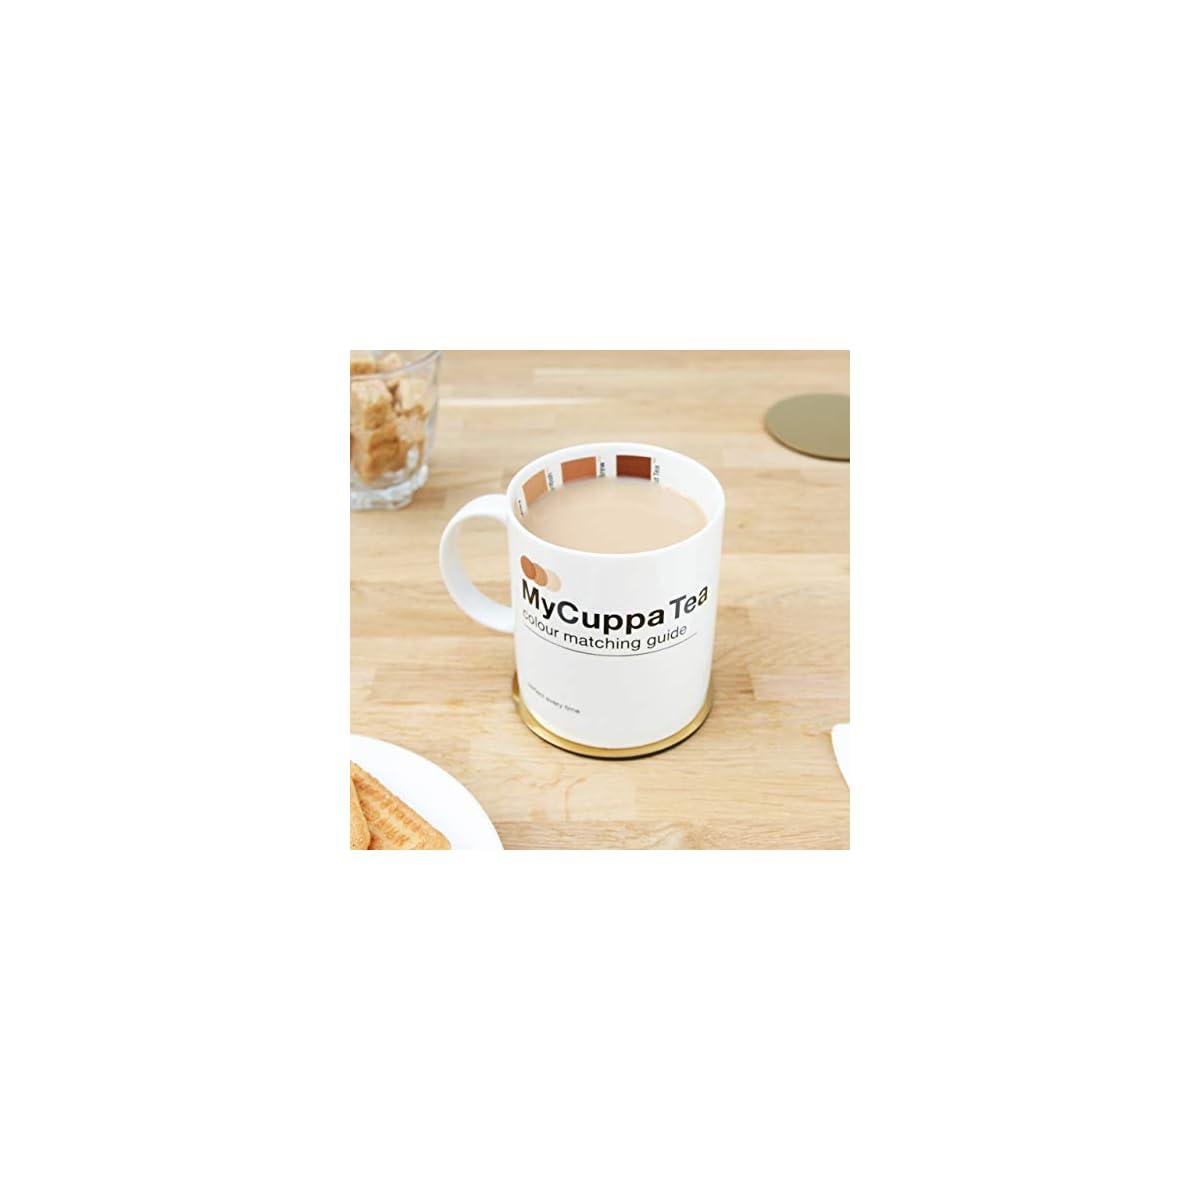 My Cuppa Tea pantone colour matching mug